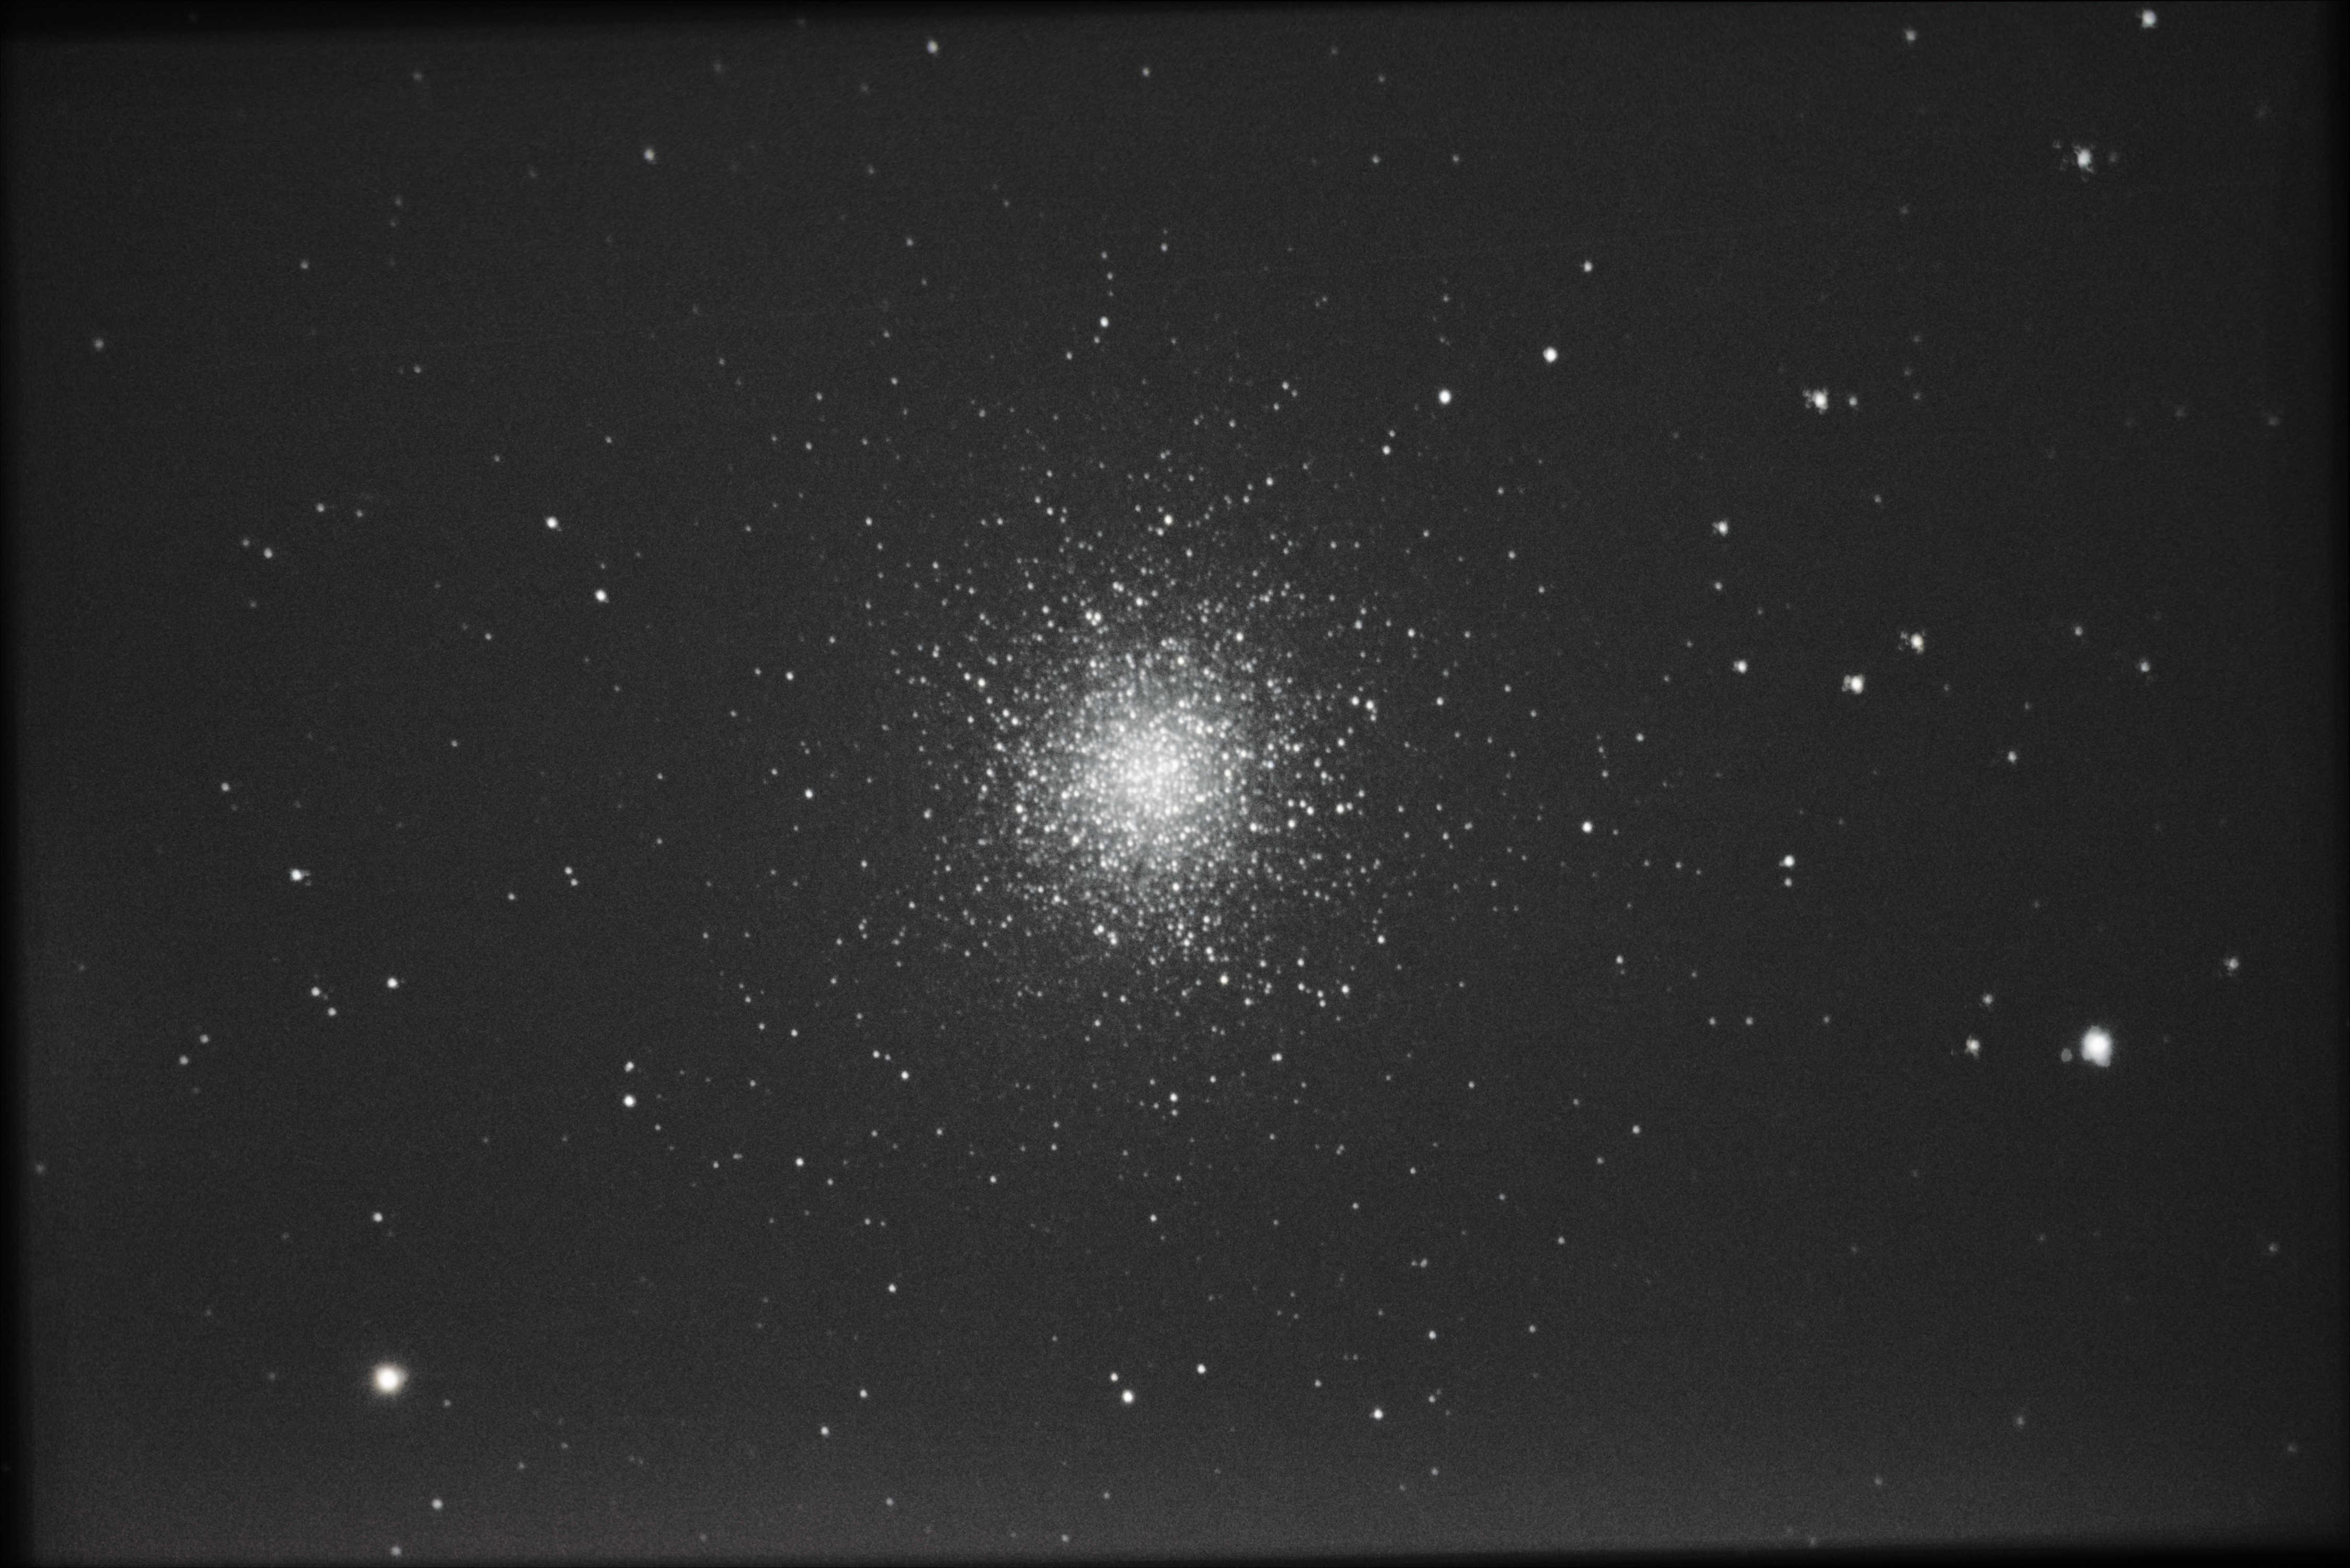 m13-st52-cr1